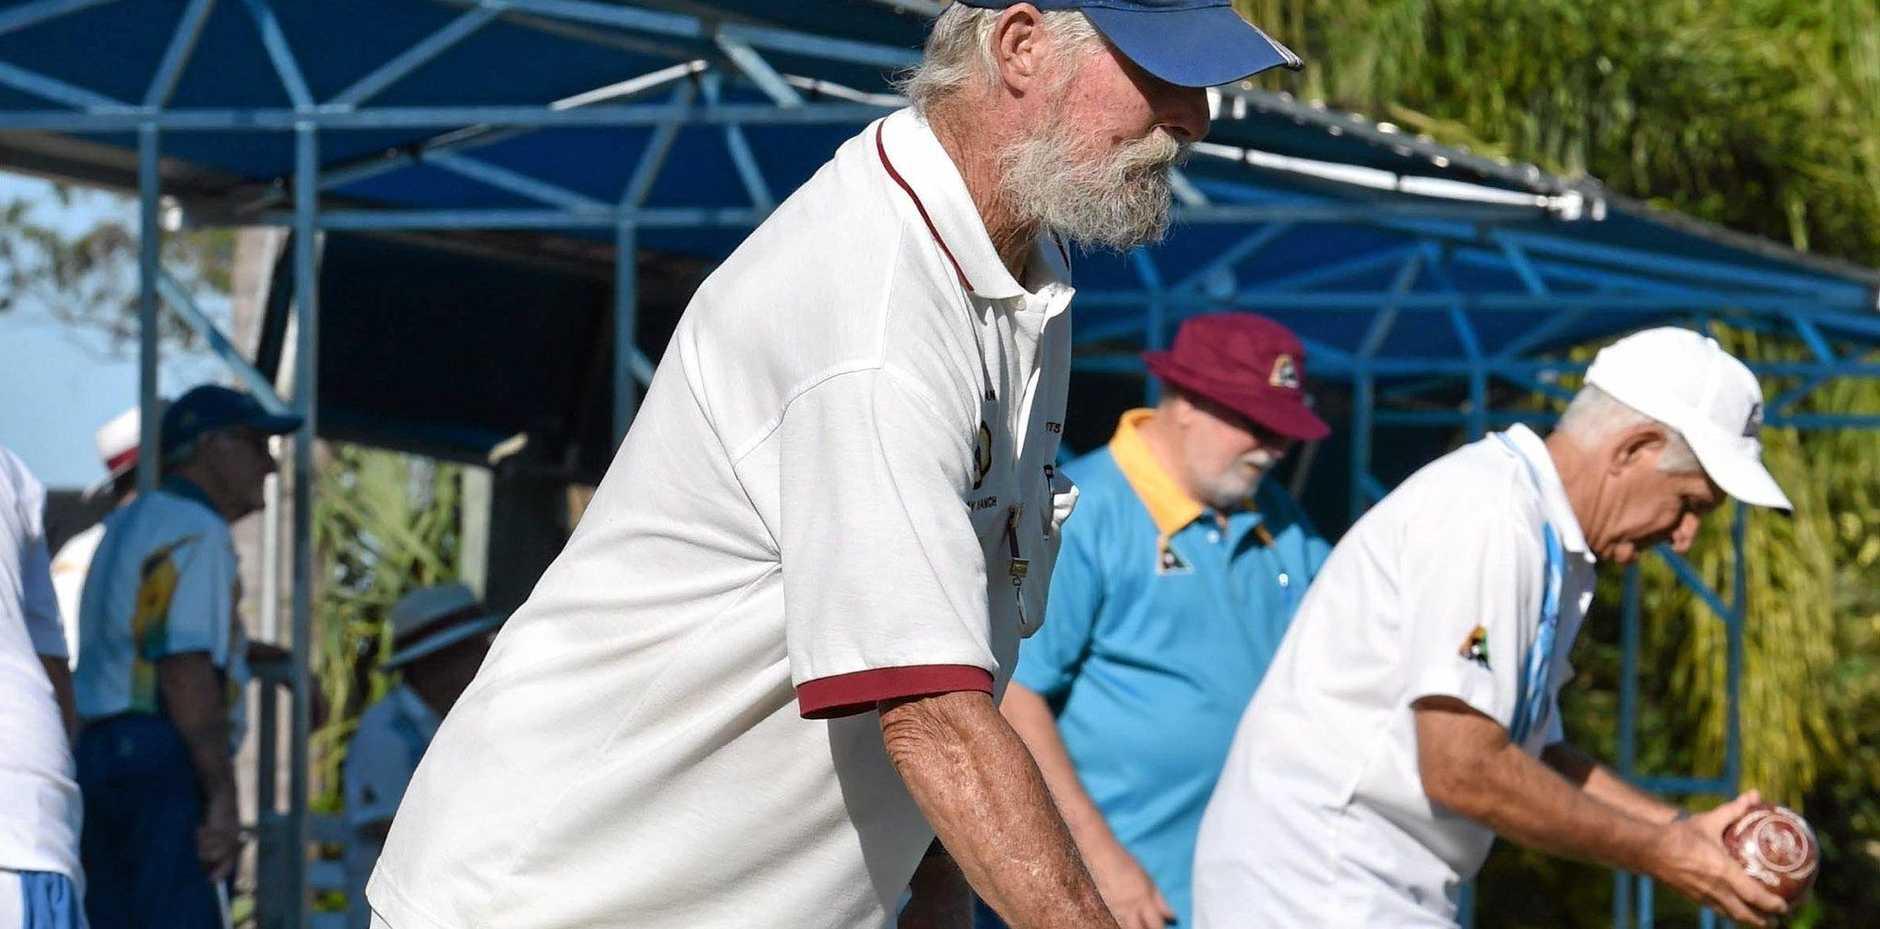 Bill Karran at Doon Villa Bowls Club.